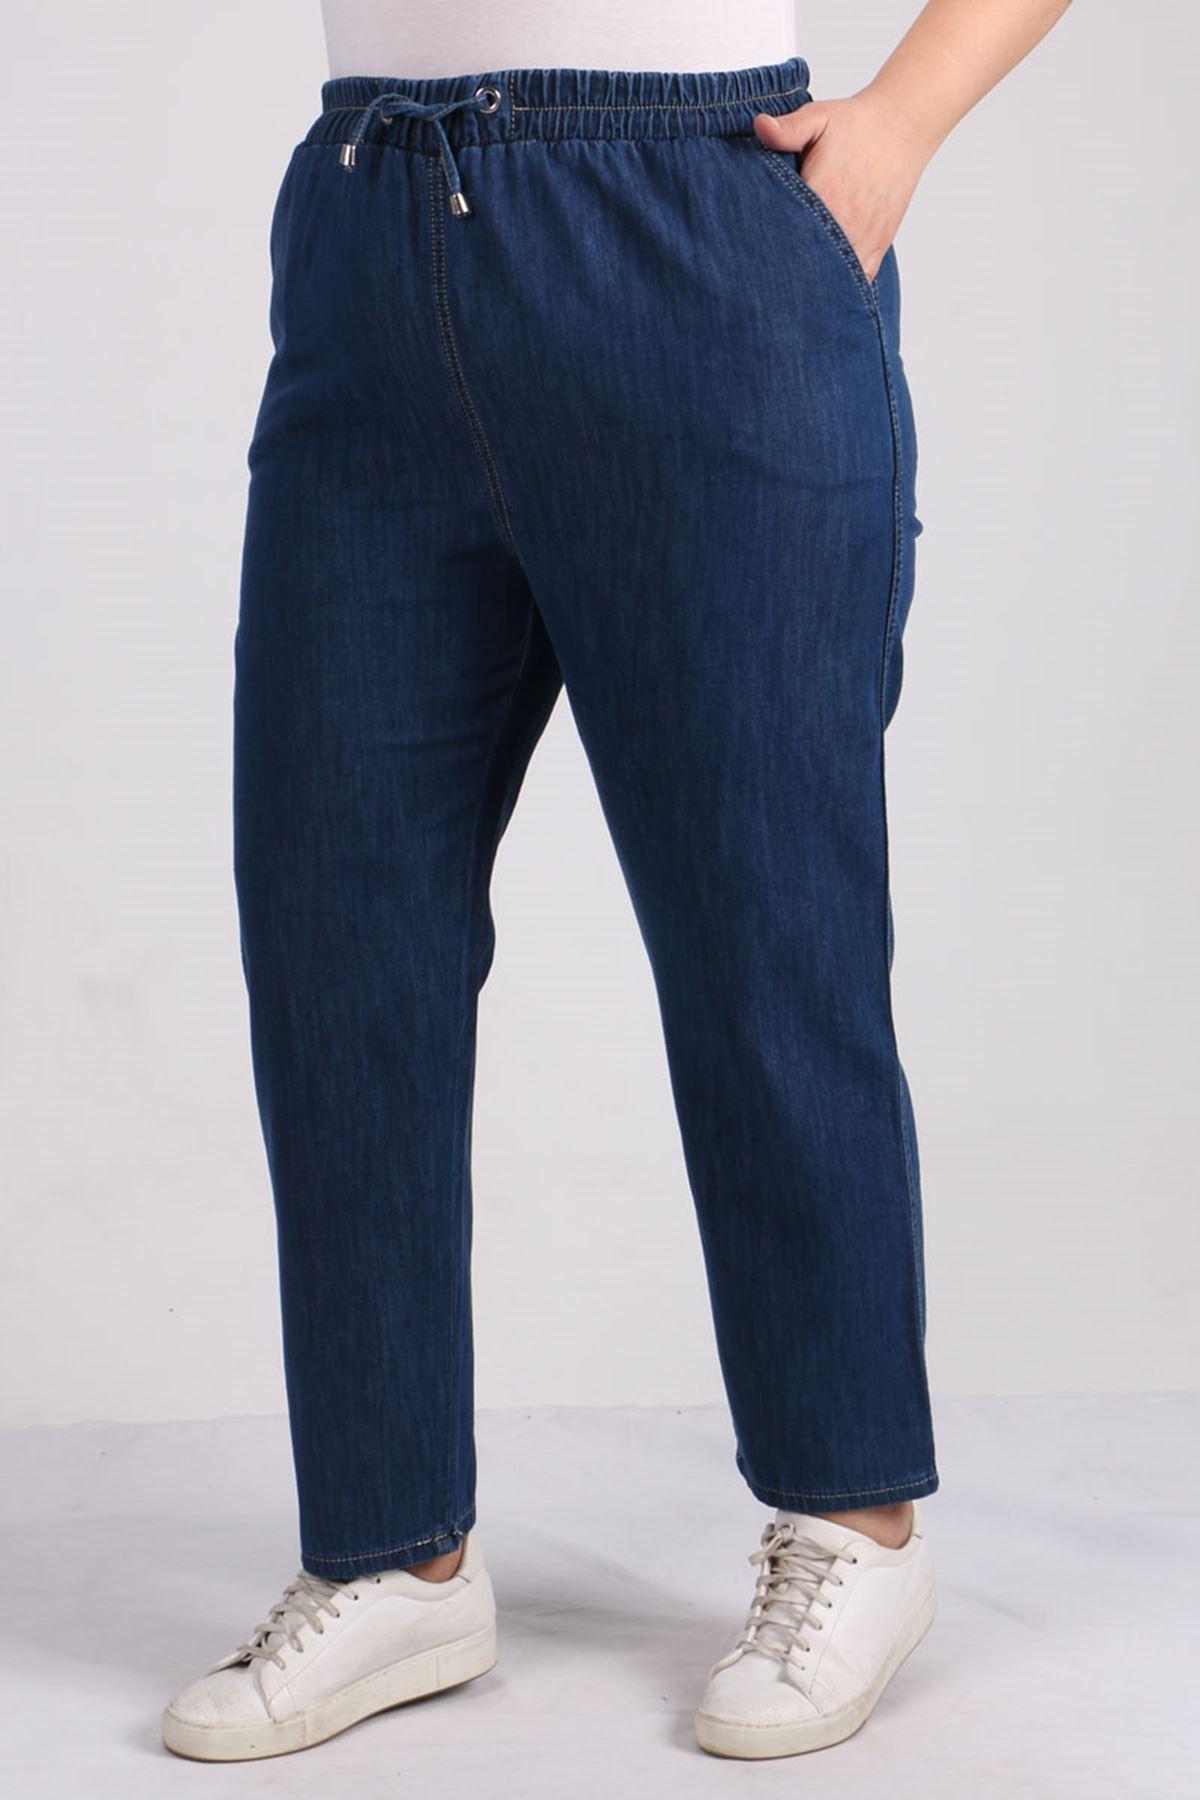 9123 Plus Size Elastic Waist Skinny Leg Jeans - Dark Blue